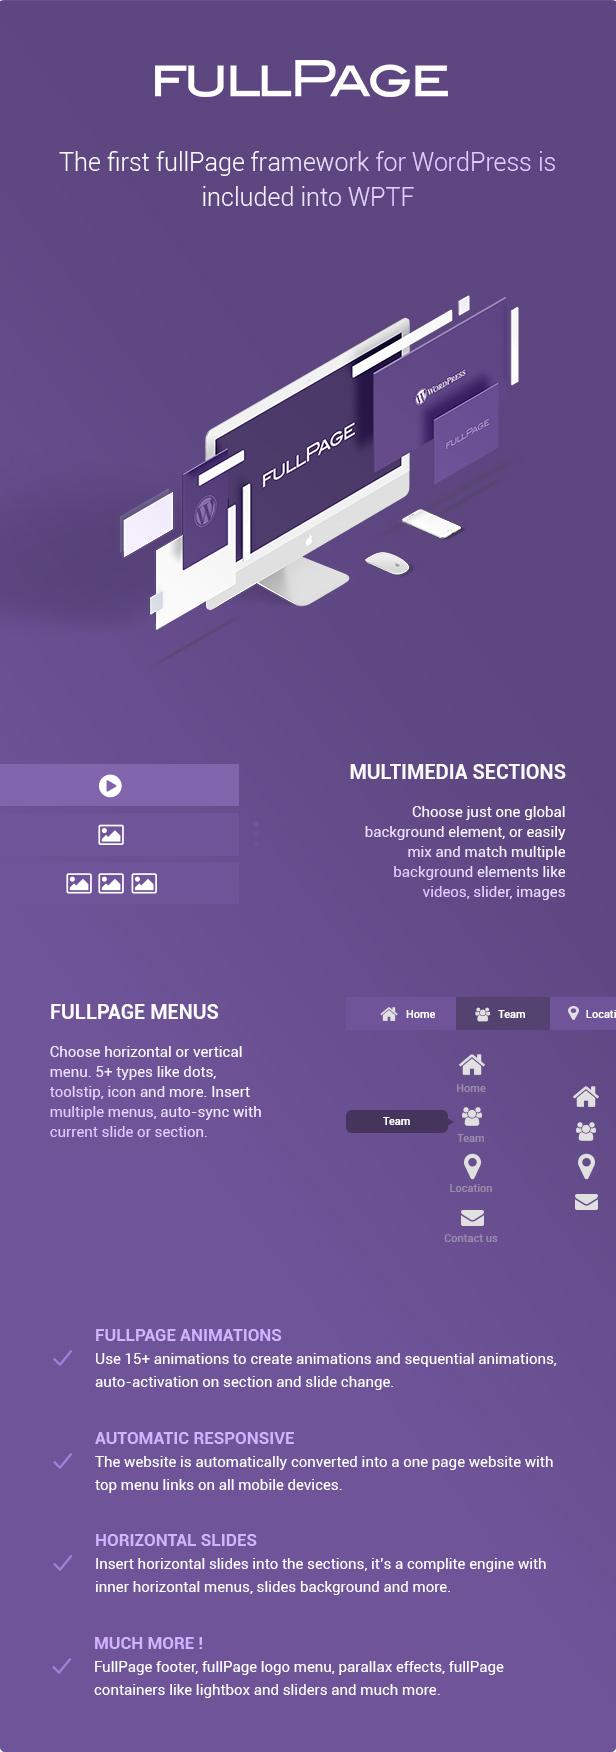 WPTF - WordPress Theme Framework & fullPage Framework 2